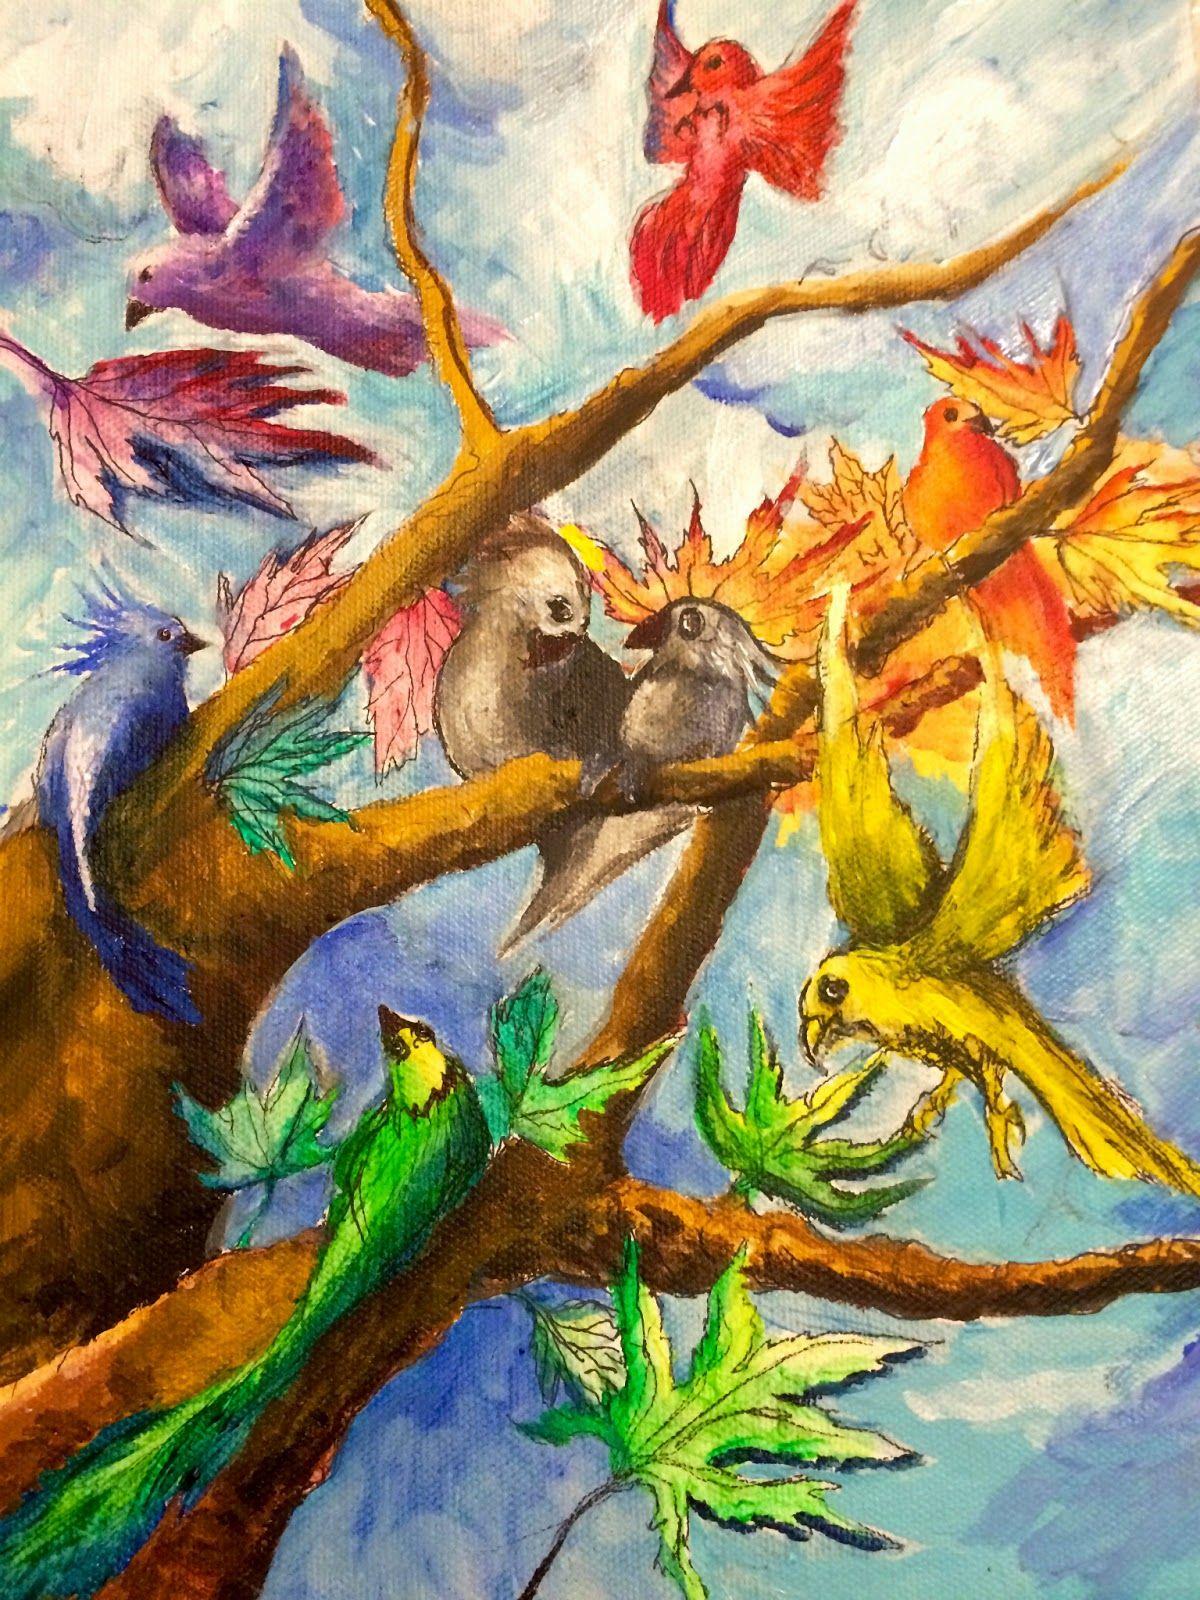 The Helpful Art Teacher Draw A Bird Day Steam In The